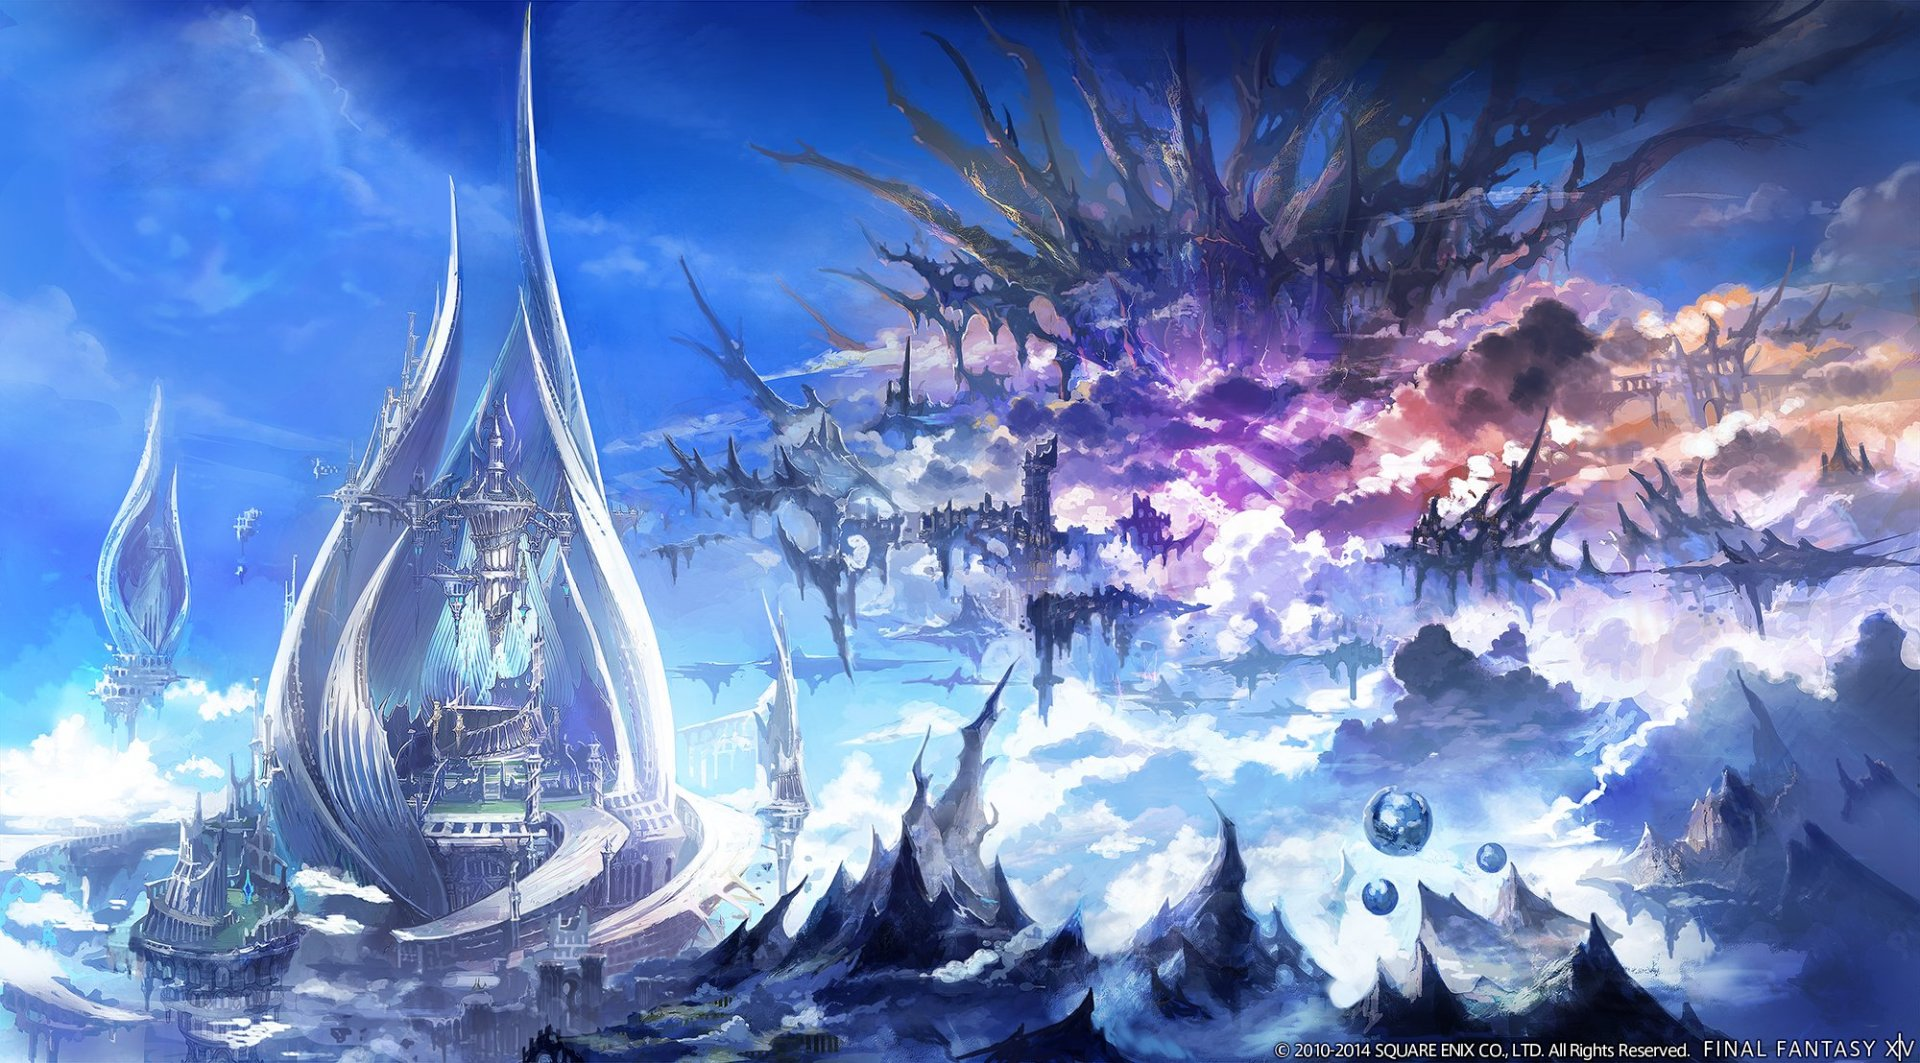 39 units of Final Fantasy Wallpaper